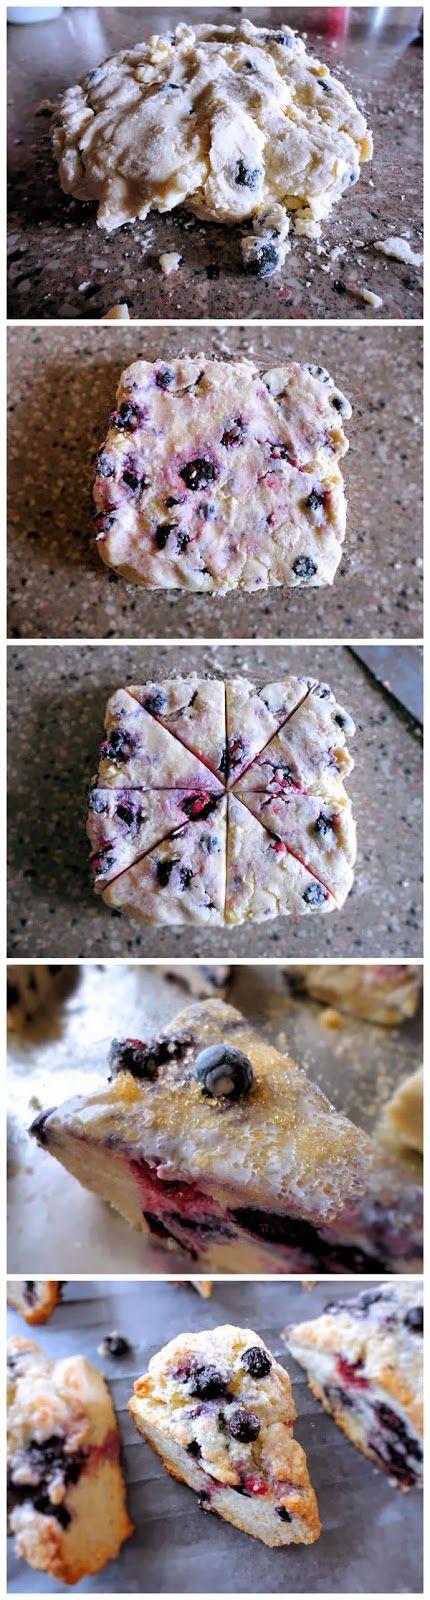 Blueberry Scones | Foodsweet | foodsweet